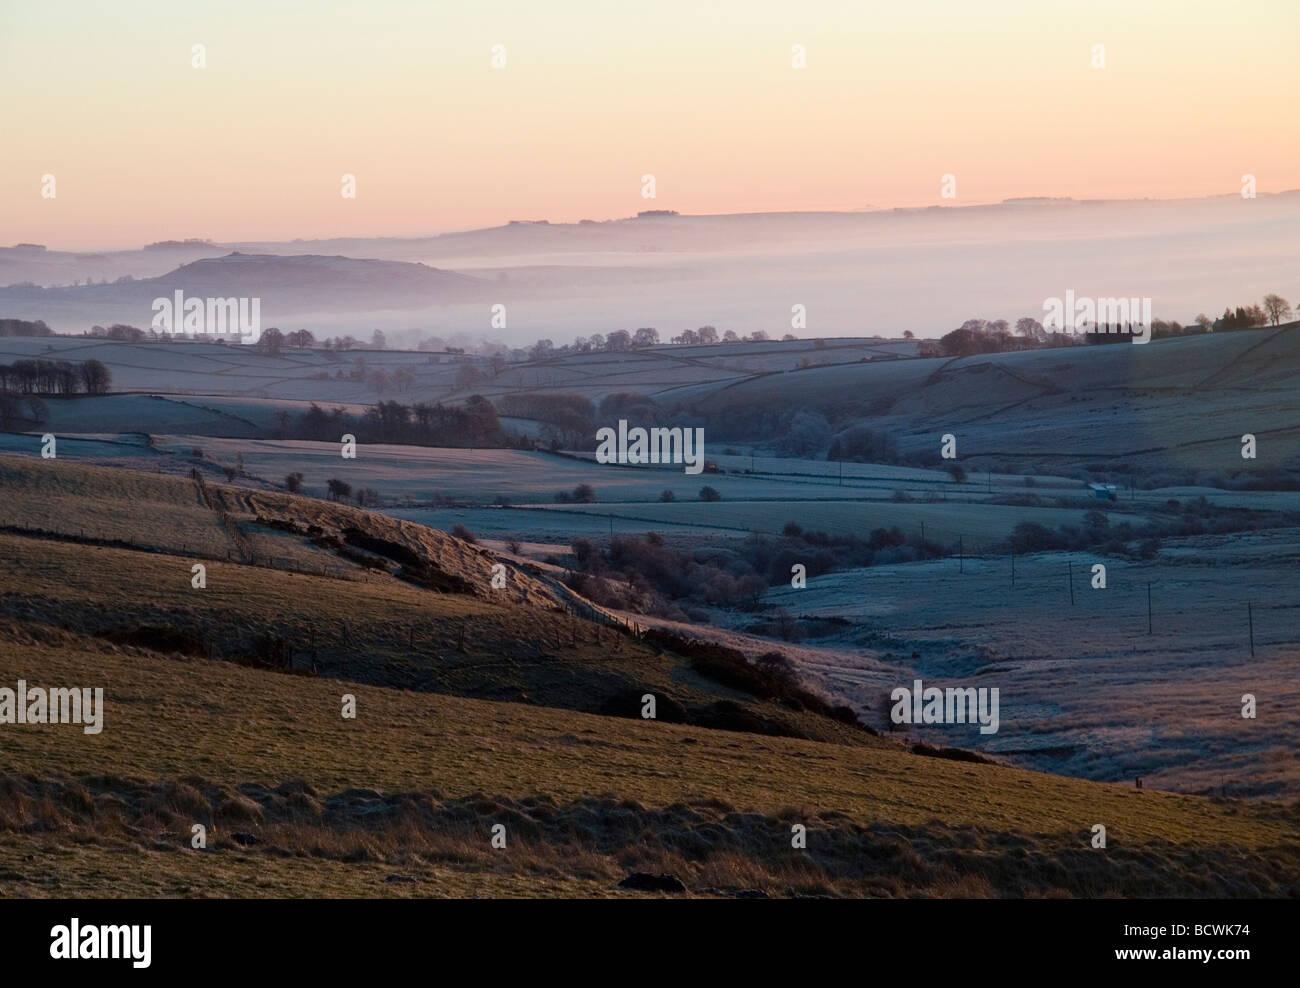 Sunrise over the frozen winter landscape near Longnor near Buxton in the Peak District, Derbyshire England UK - Stock Image